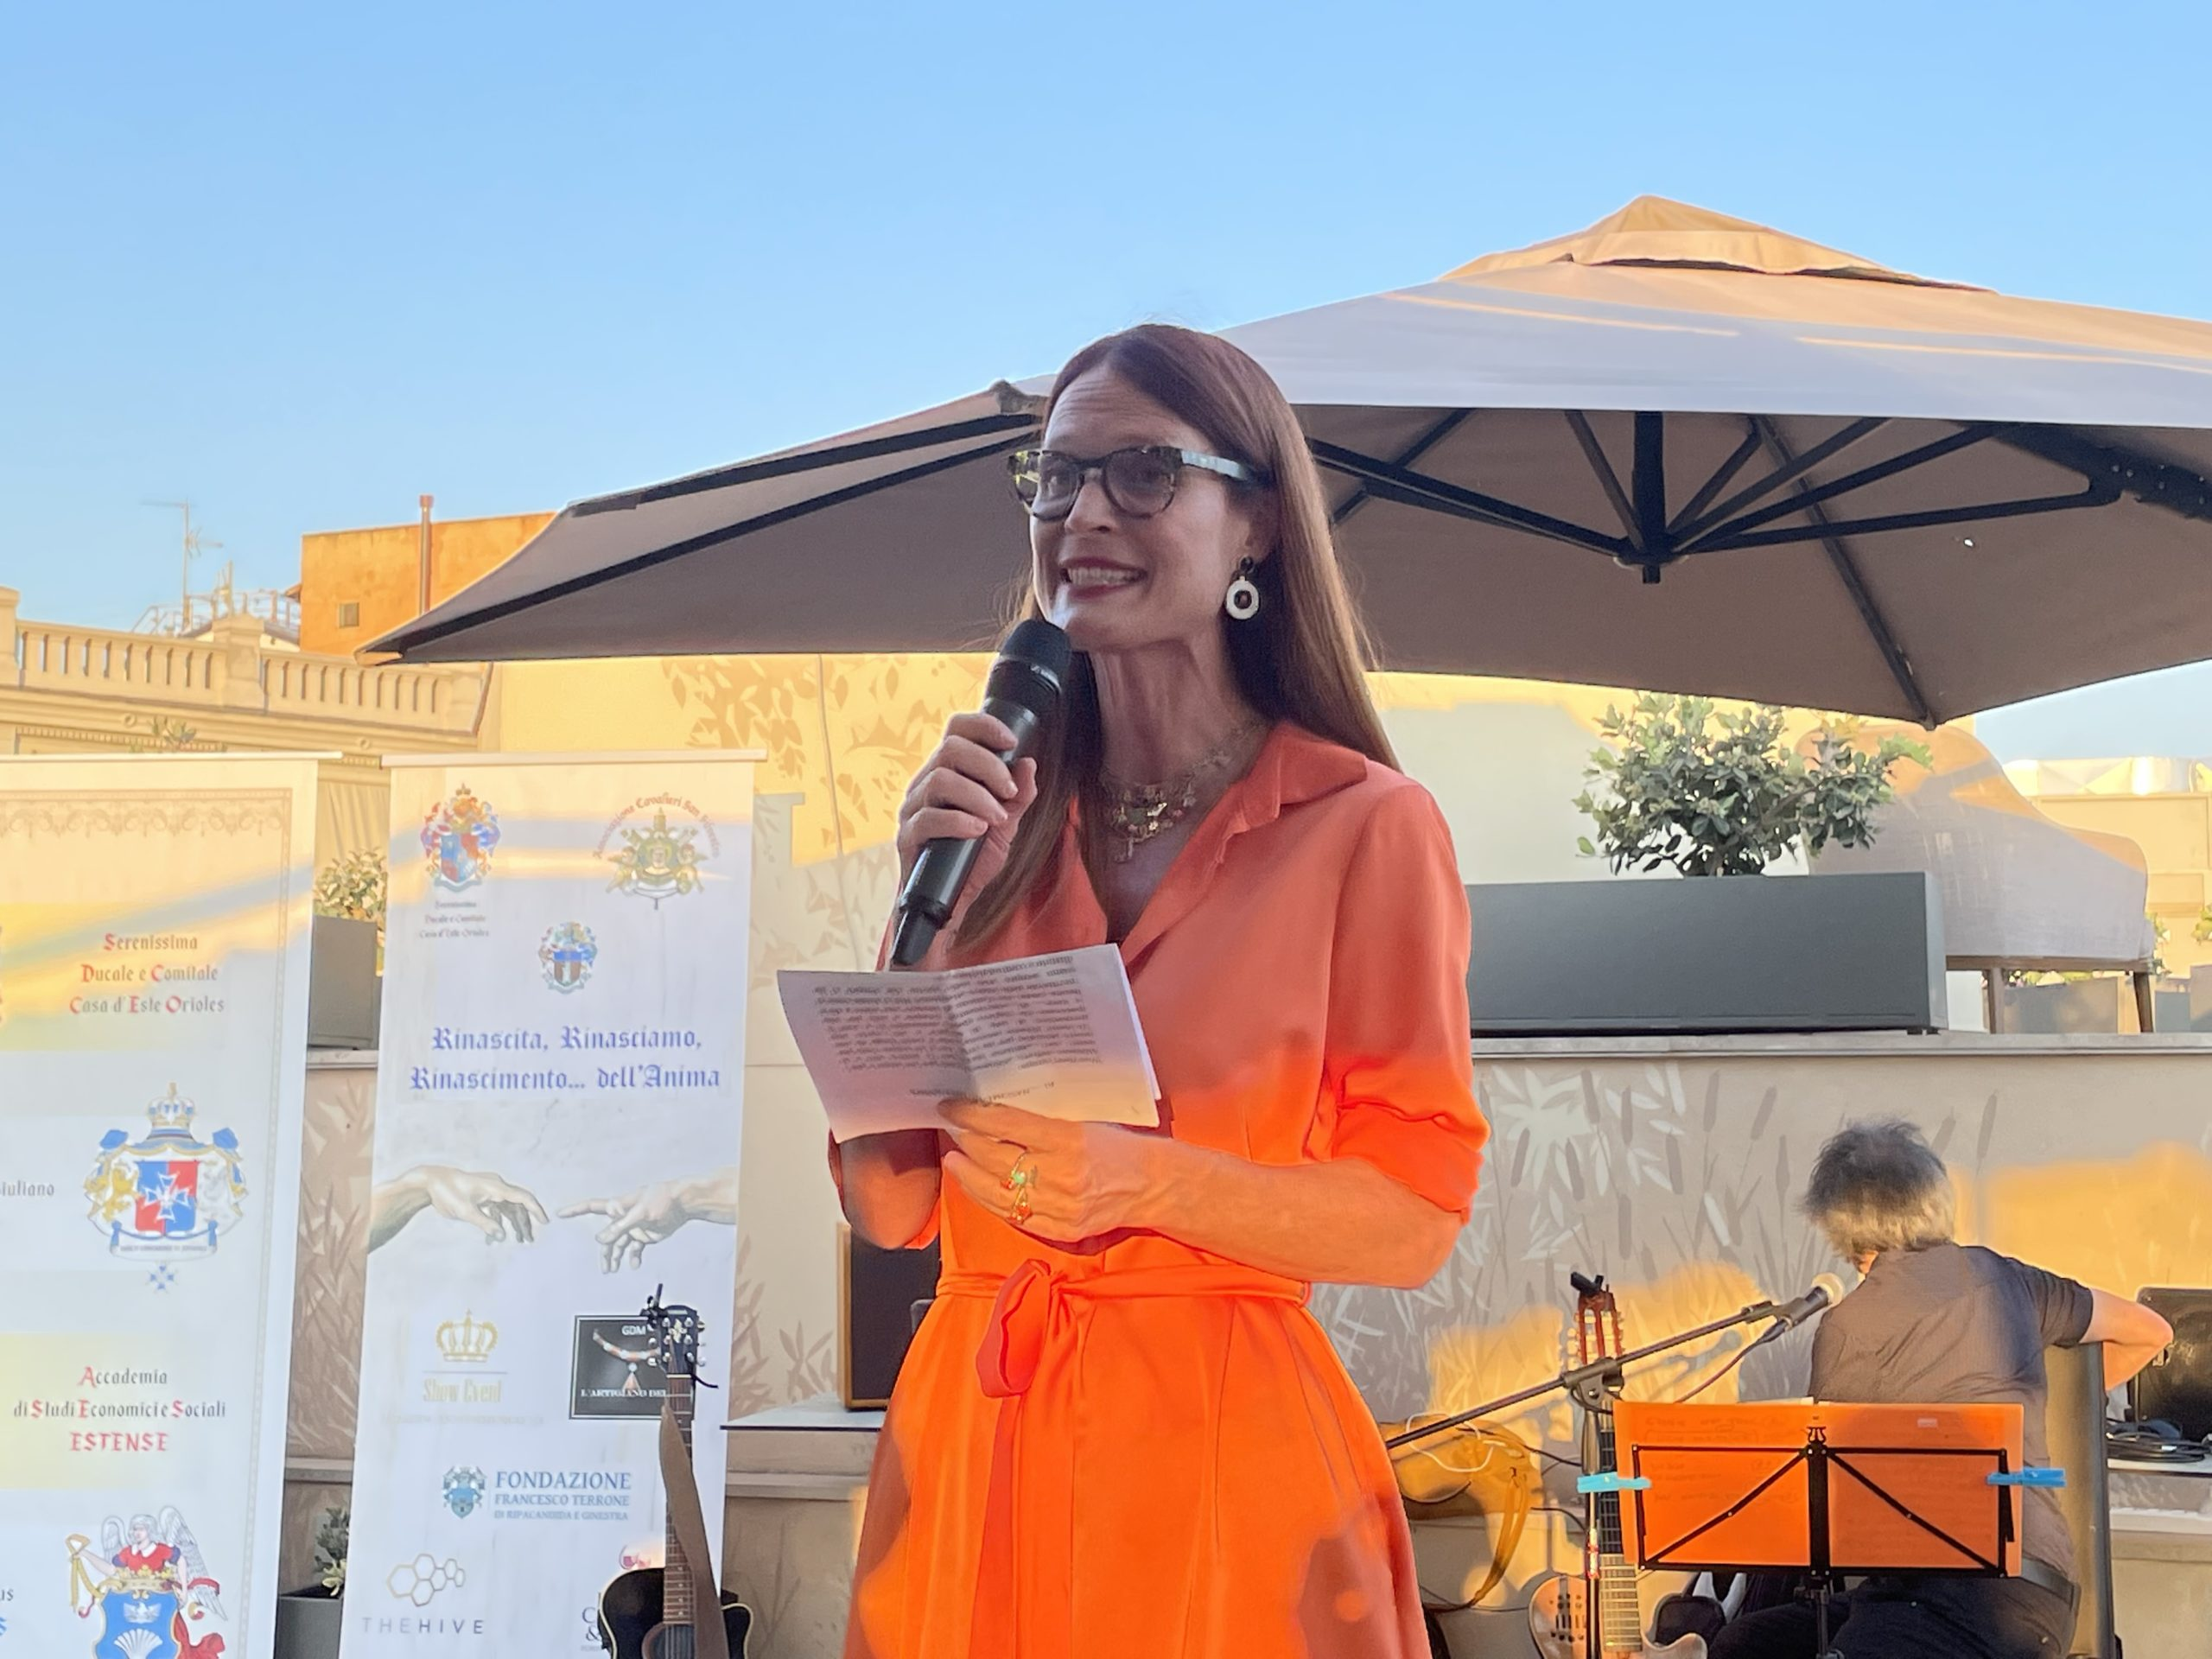 jane alexander all'evento charity rinascimento dell'anima zerkalo